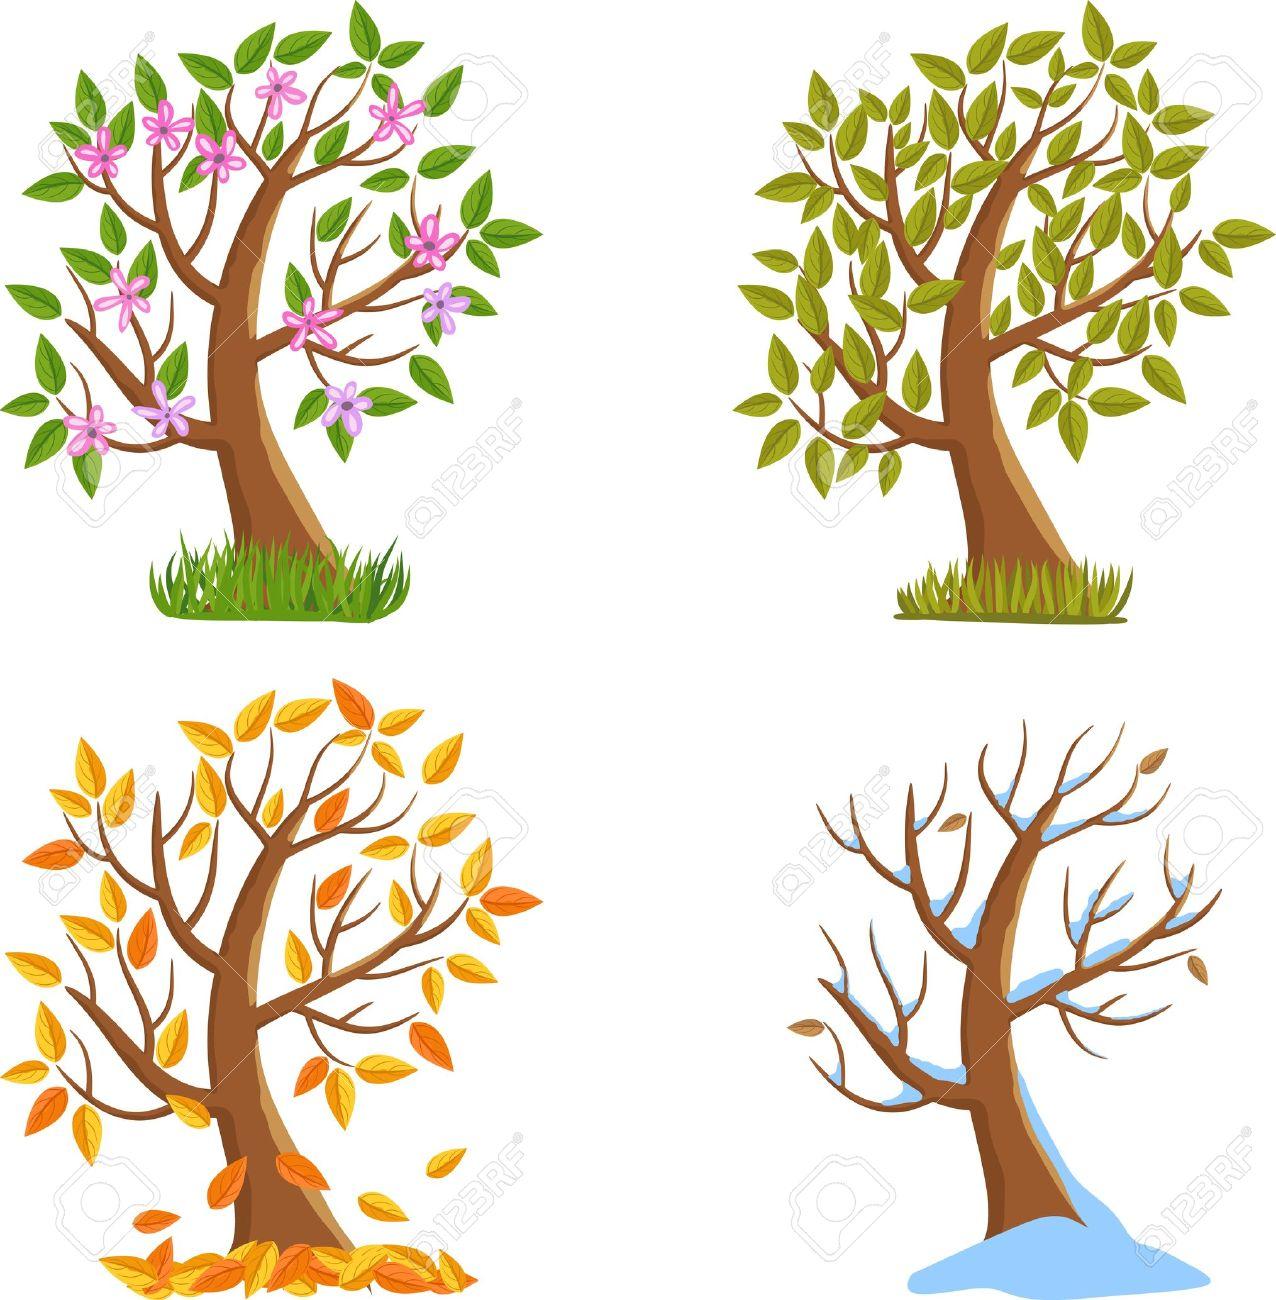 Spring, Summer, Autumn and Winter Tree Illustration. - 16038061